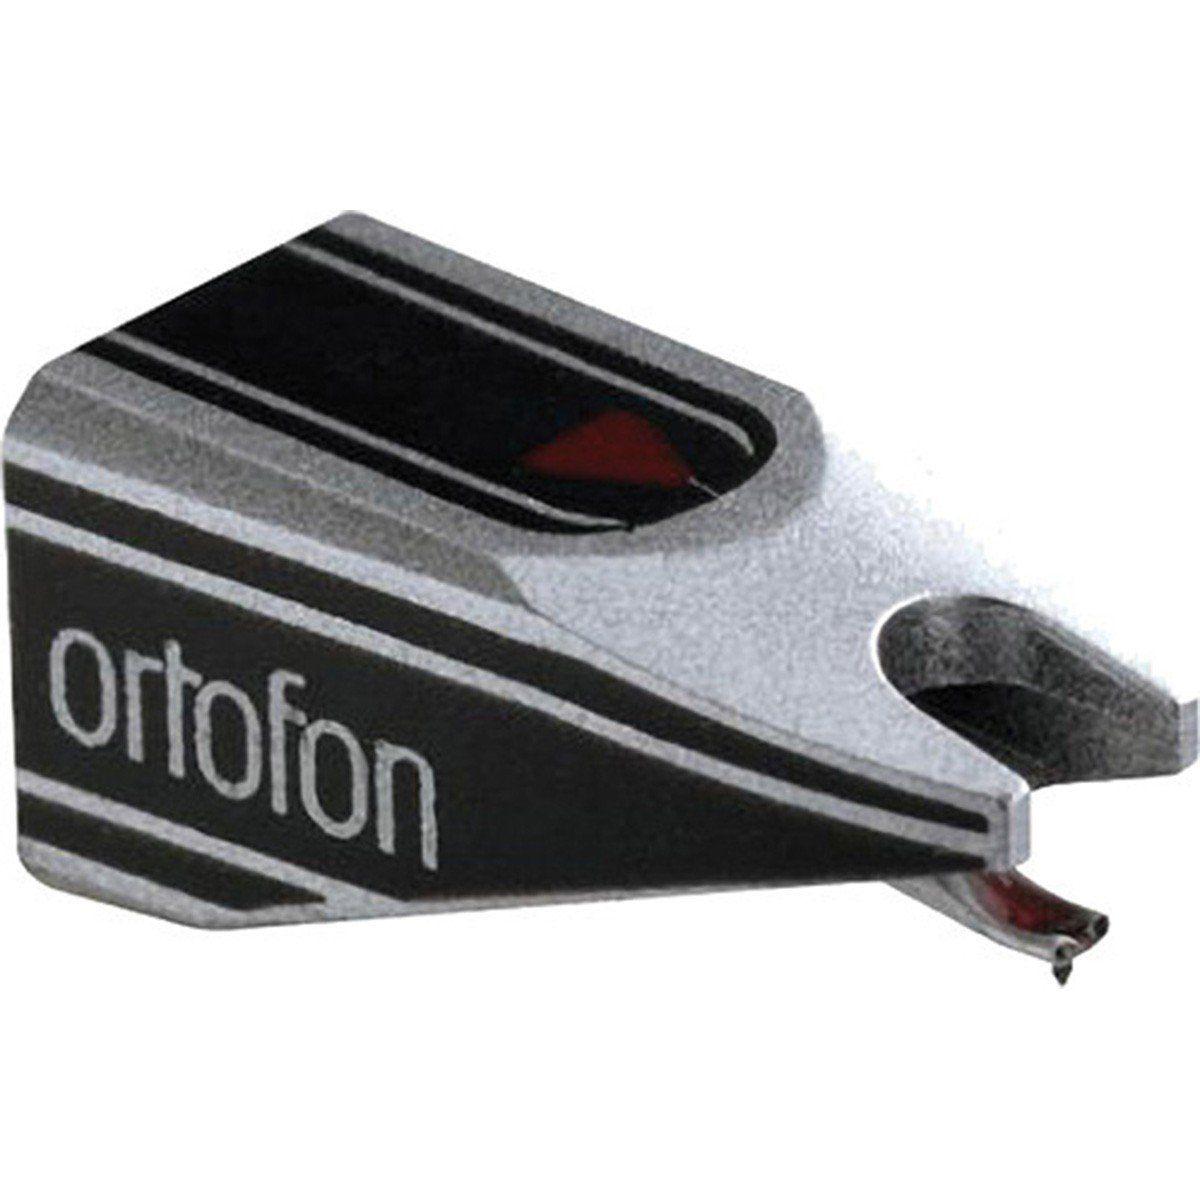 Ortofon Stylus S120 Agulha Ortofon Stylus-S120 Spherical